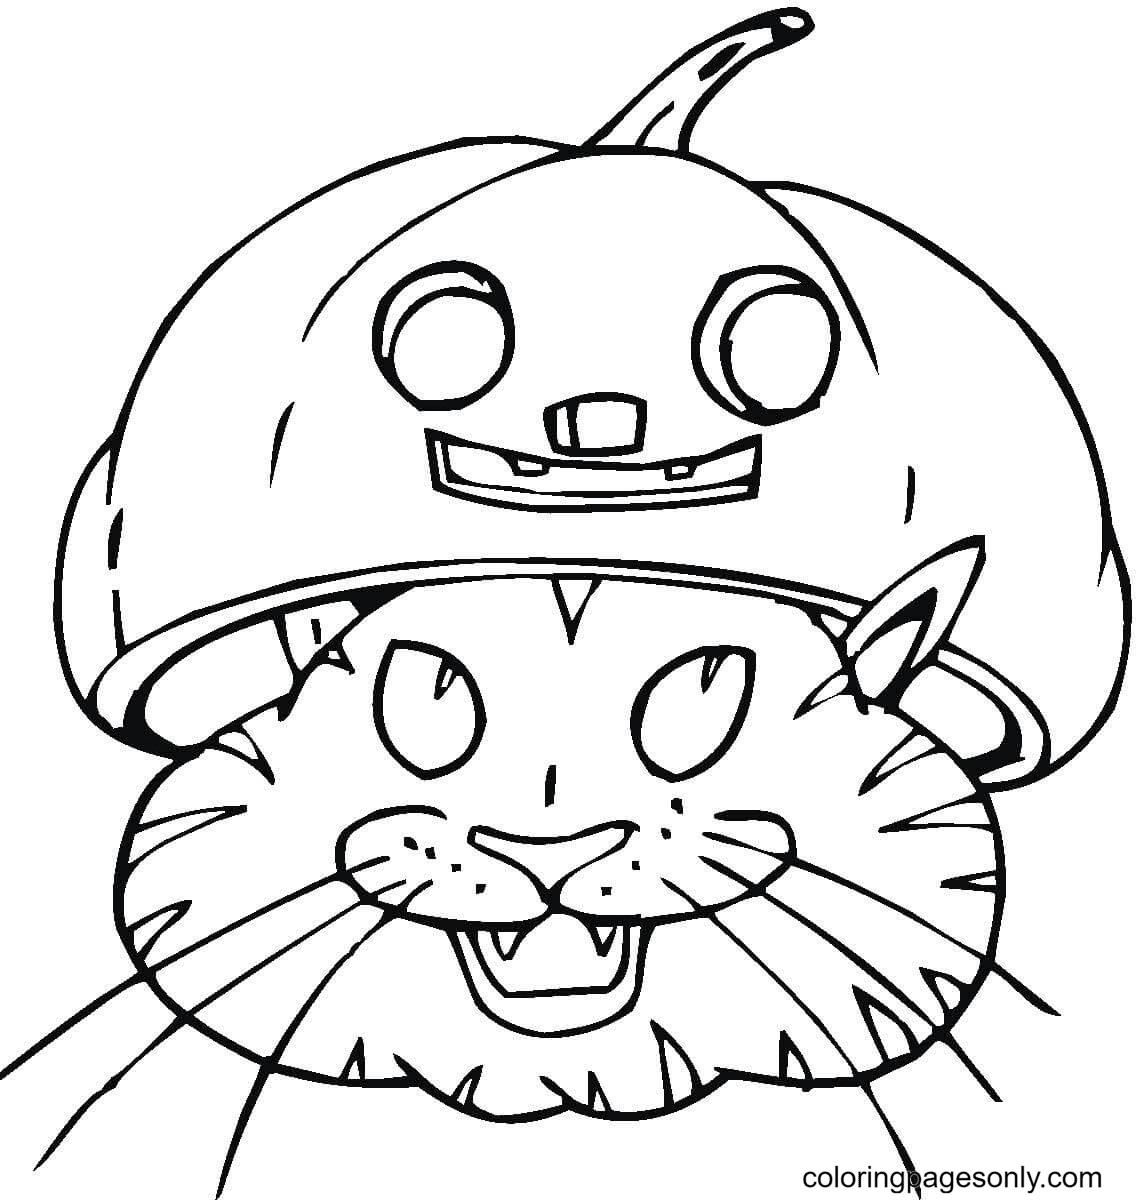 Black Cat In Jack-o'-lantern Coloring Page